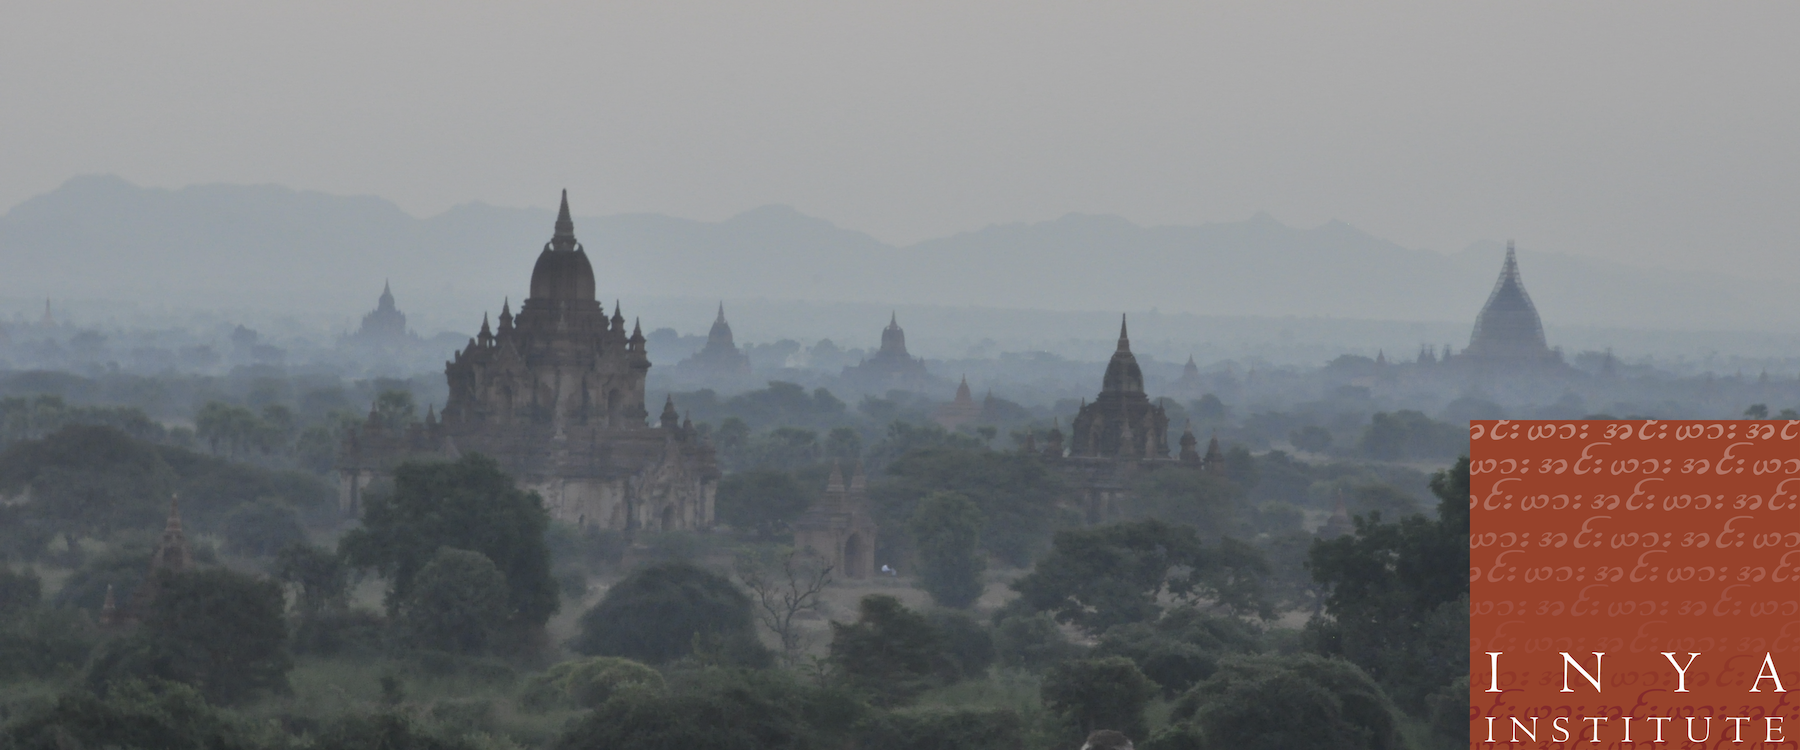 MYANMAR - Inya